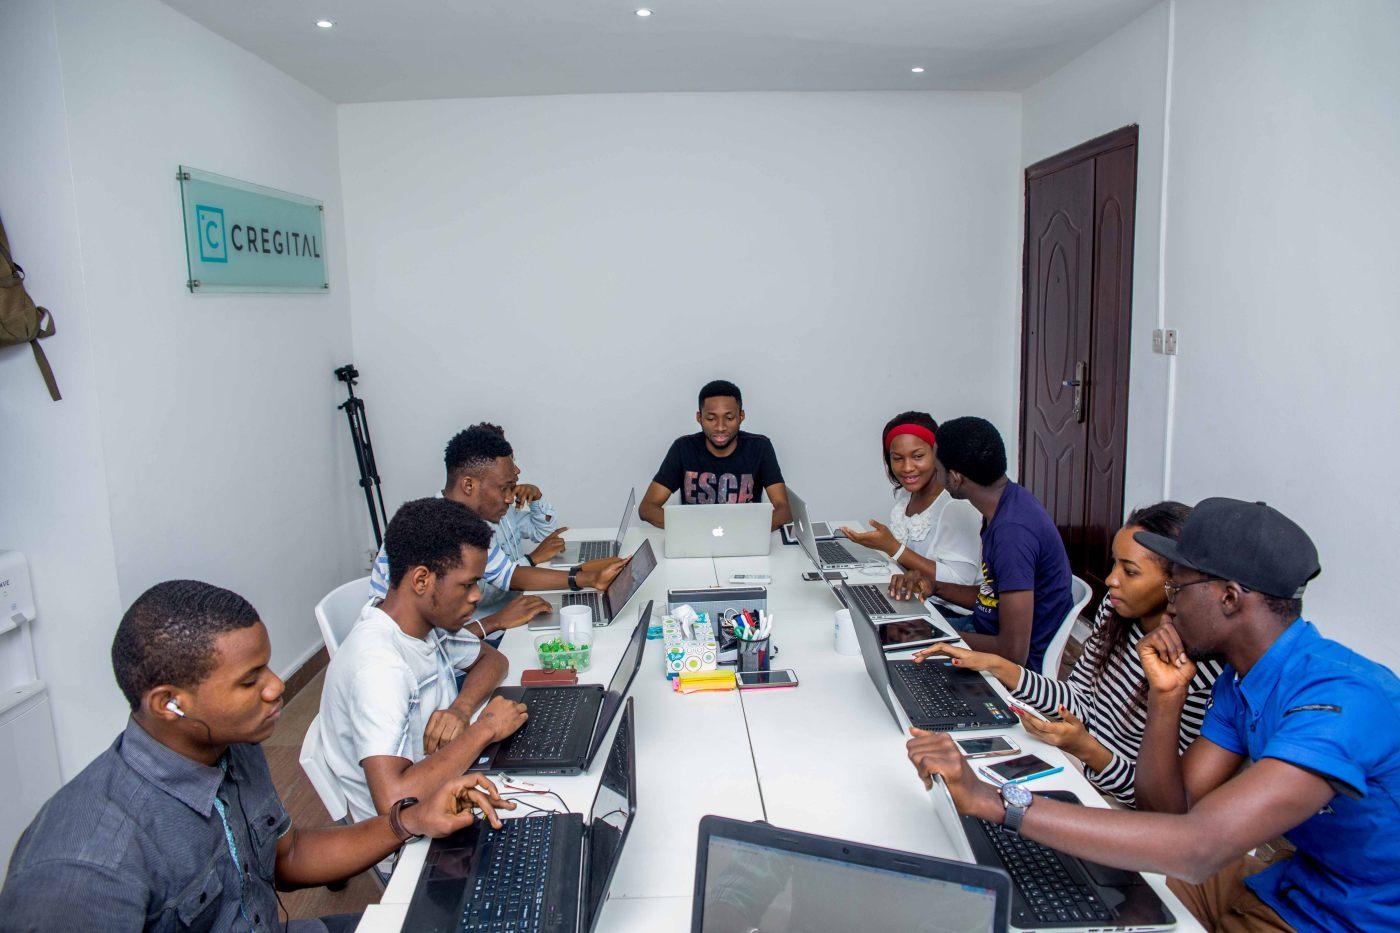 Cregital Design Agency Team 03